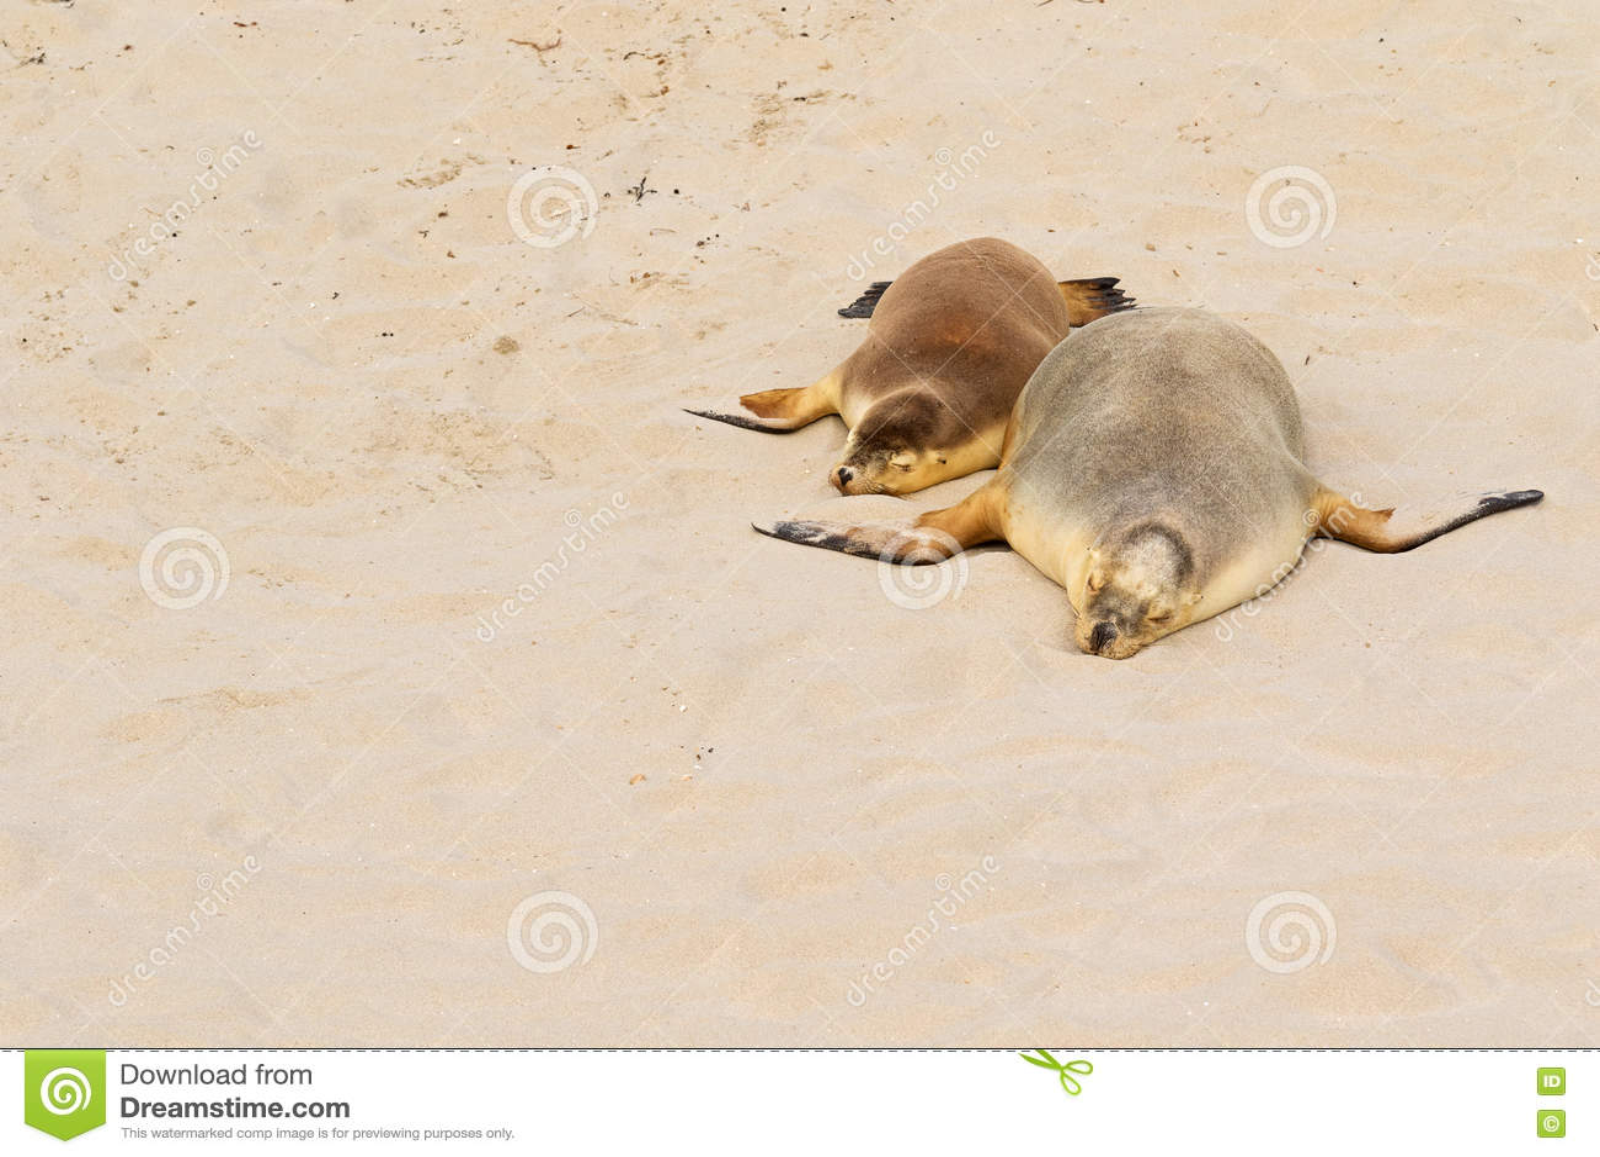 Two Australian Sea Lions Sleeping On Warm Sand At Seal Bay, Kang Stock Photo